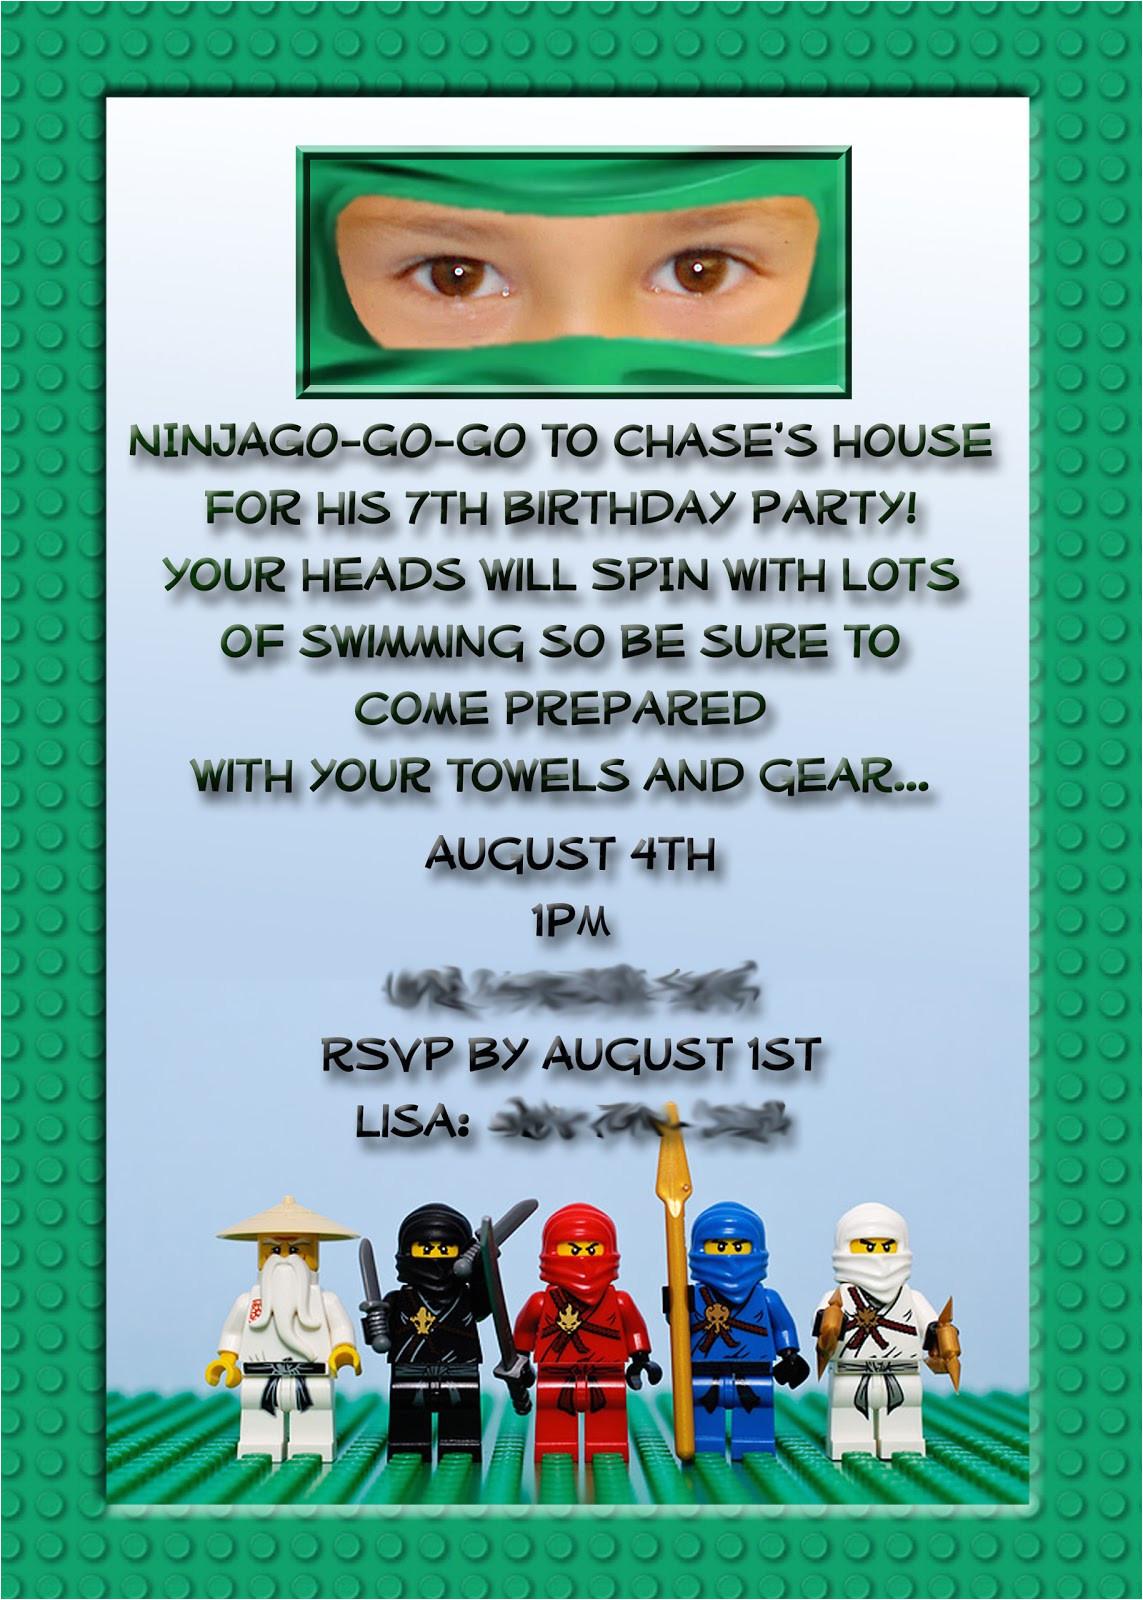 ninjago party my son chase recently had